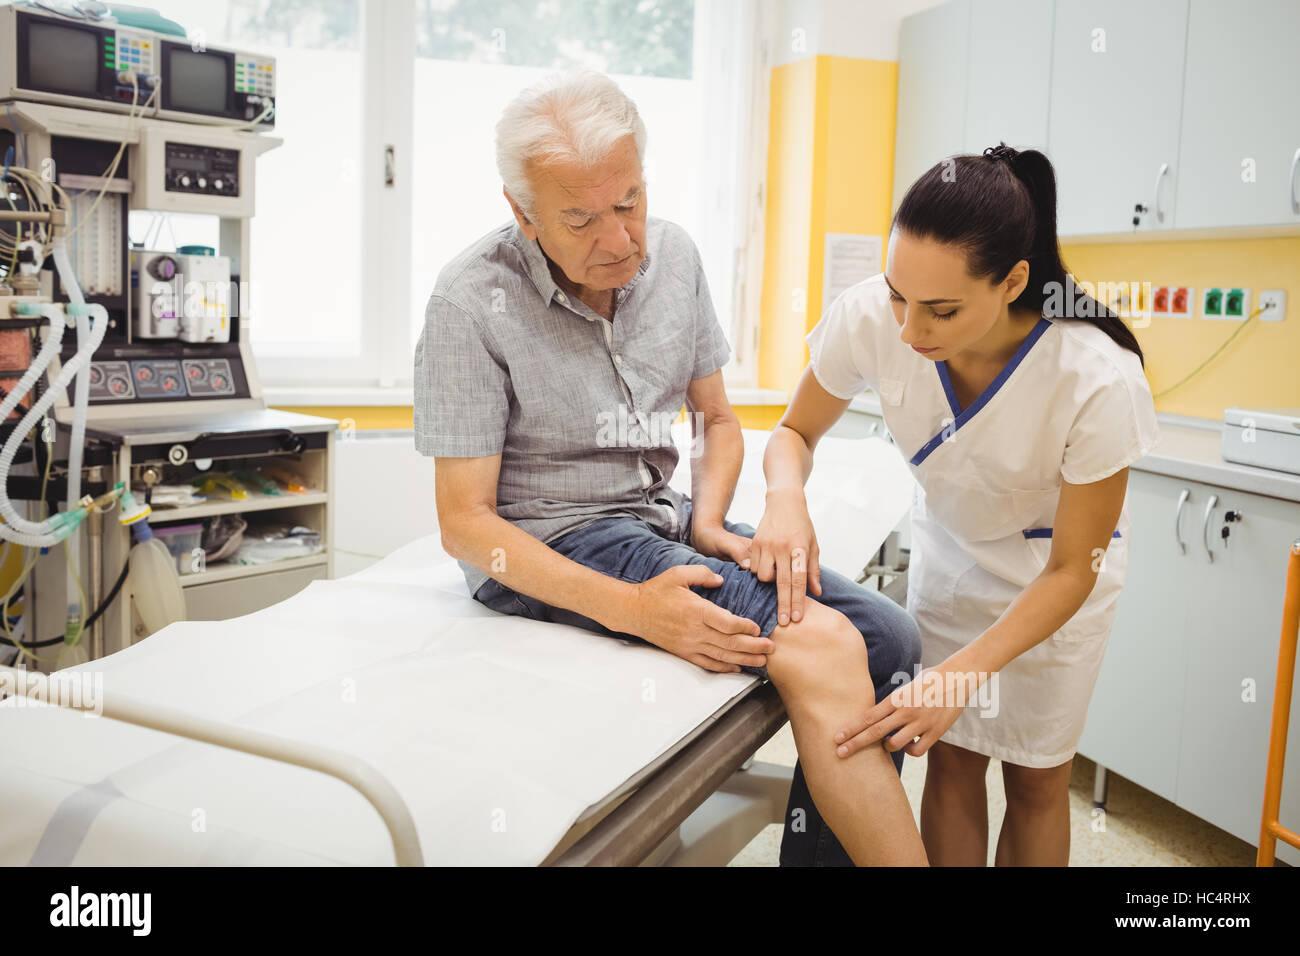 Female doctor examining patients knee - Stock Image